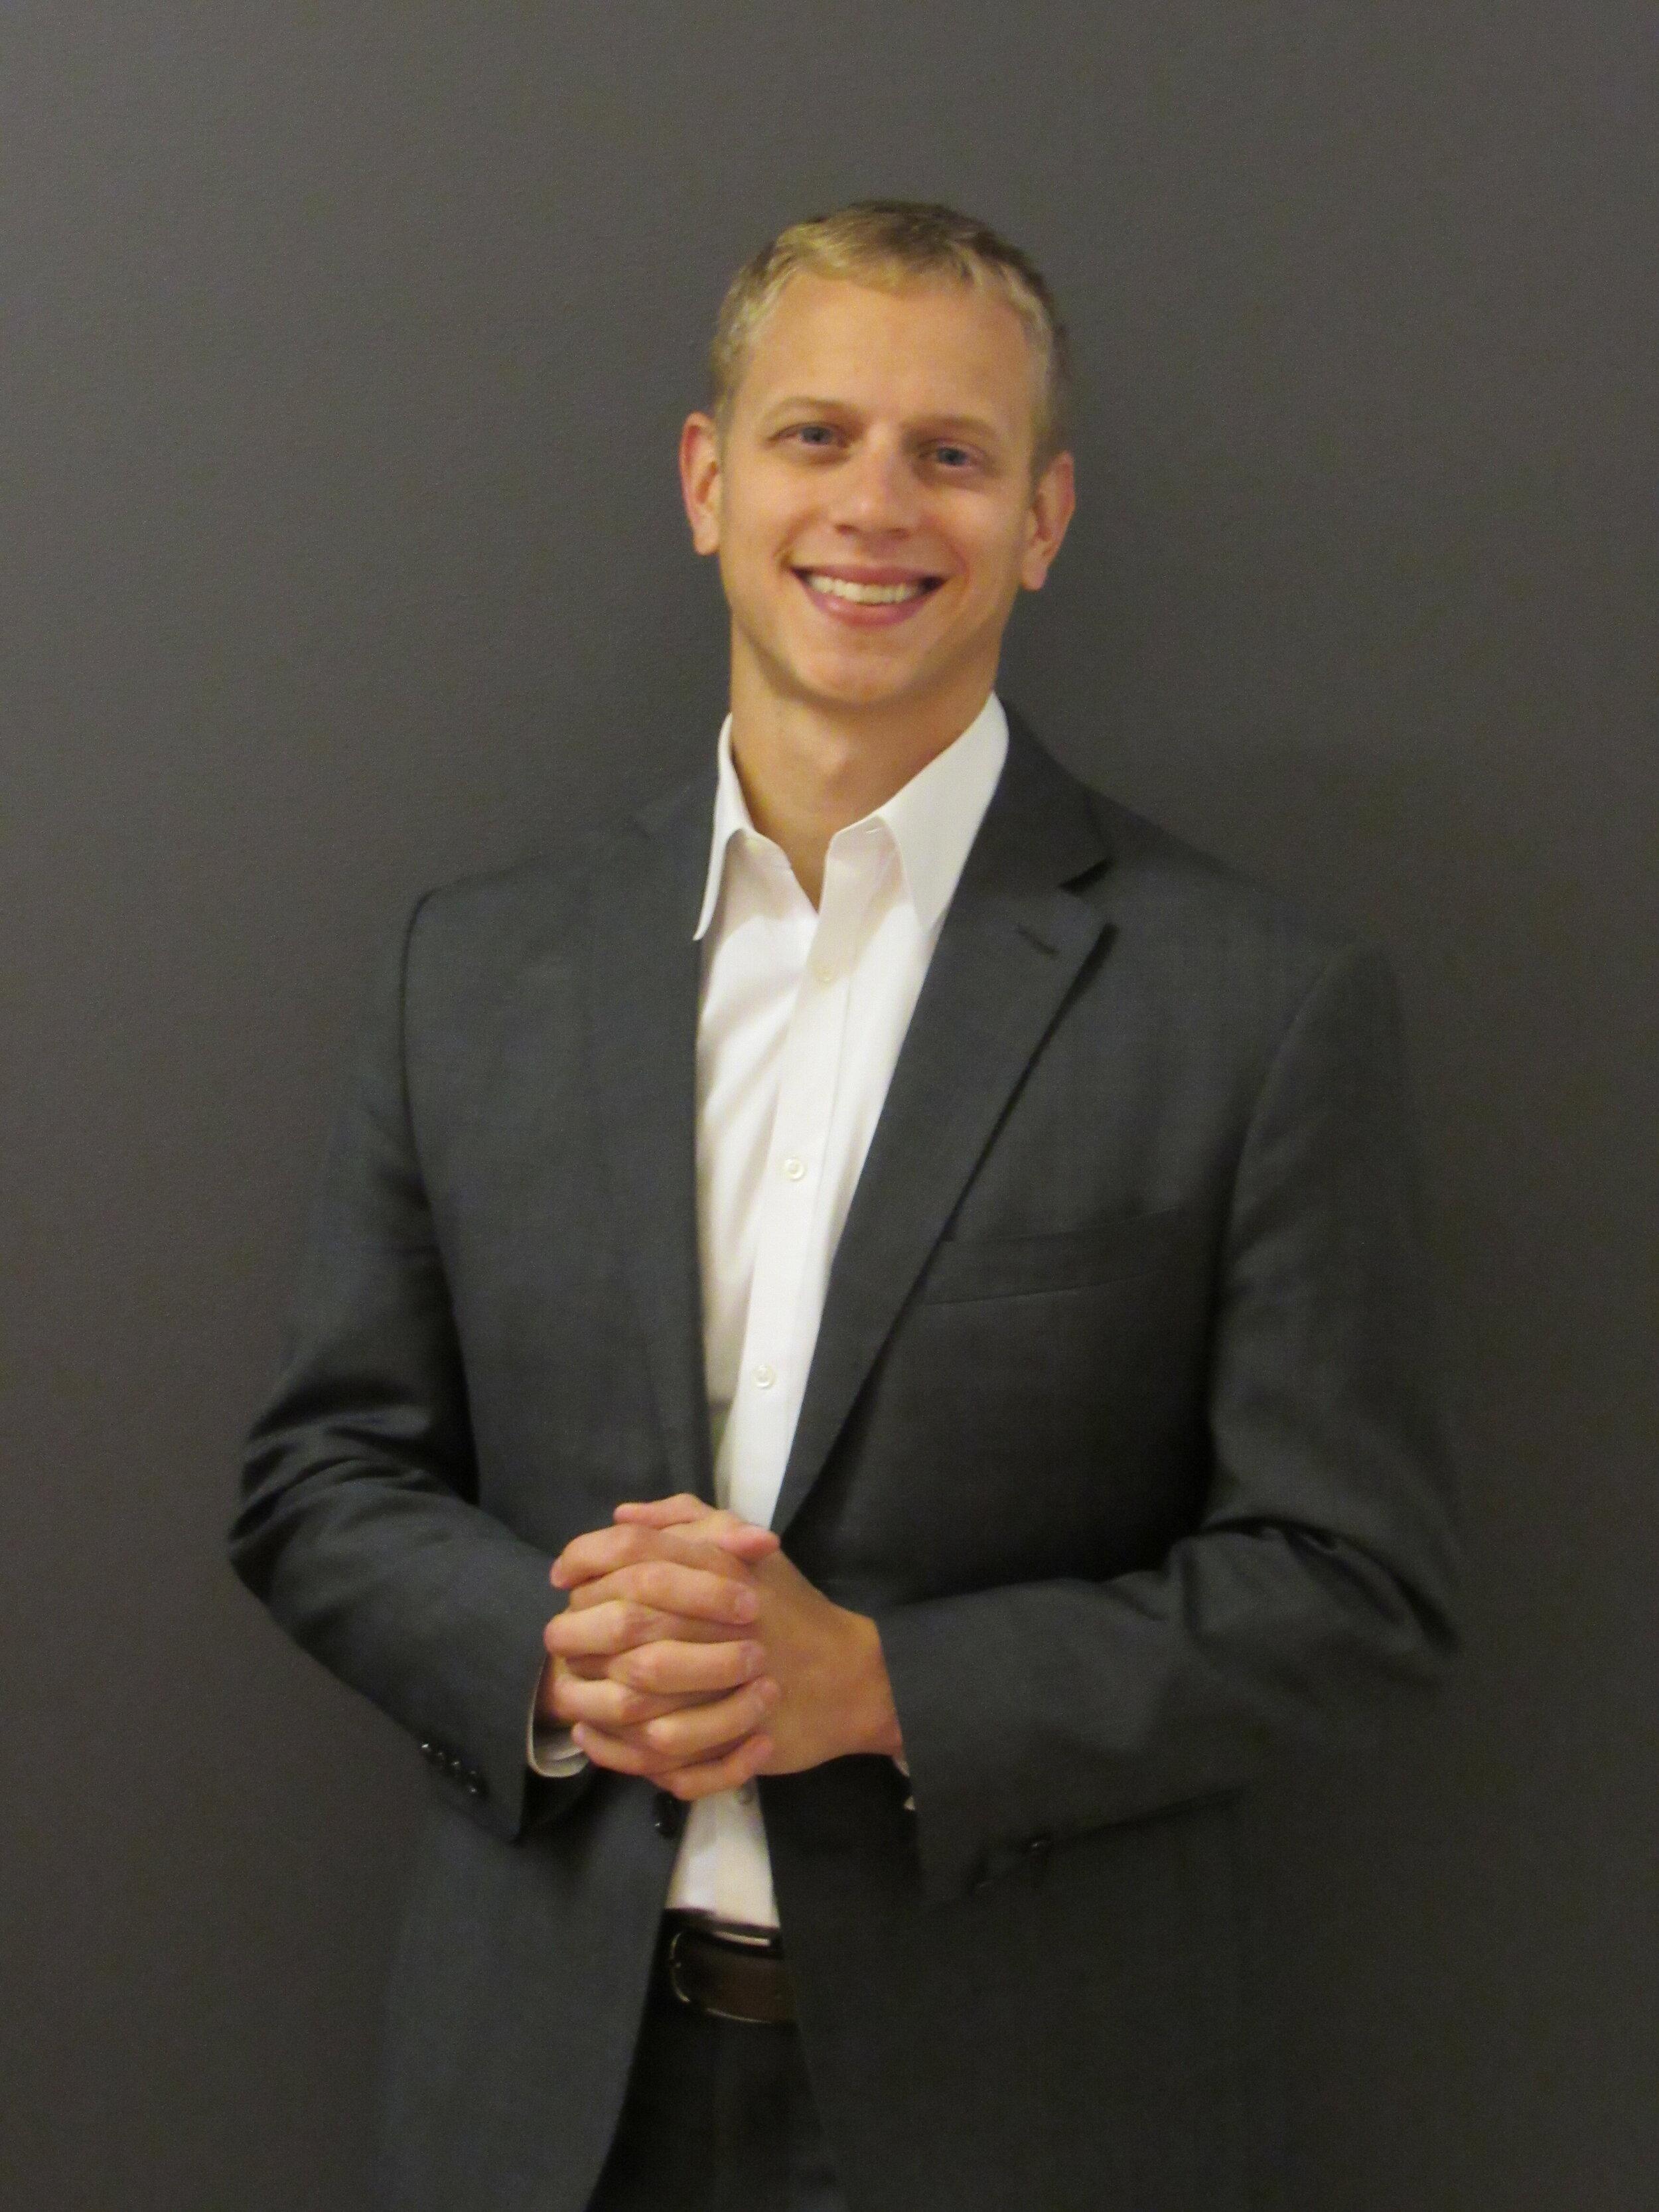 Greg Glasser, Account Executive